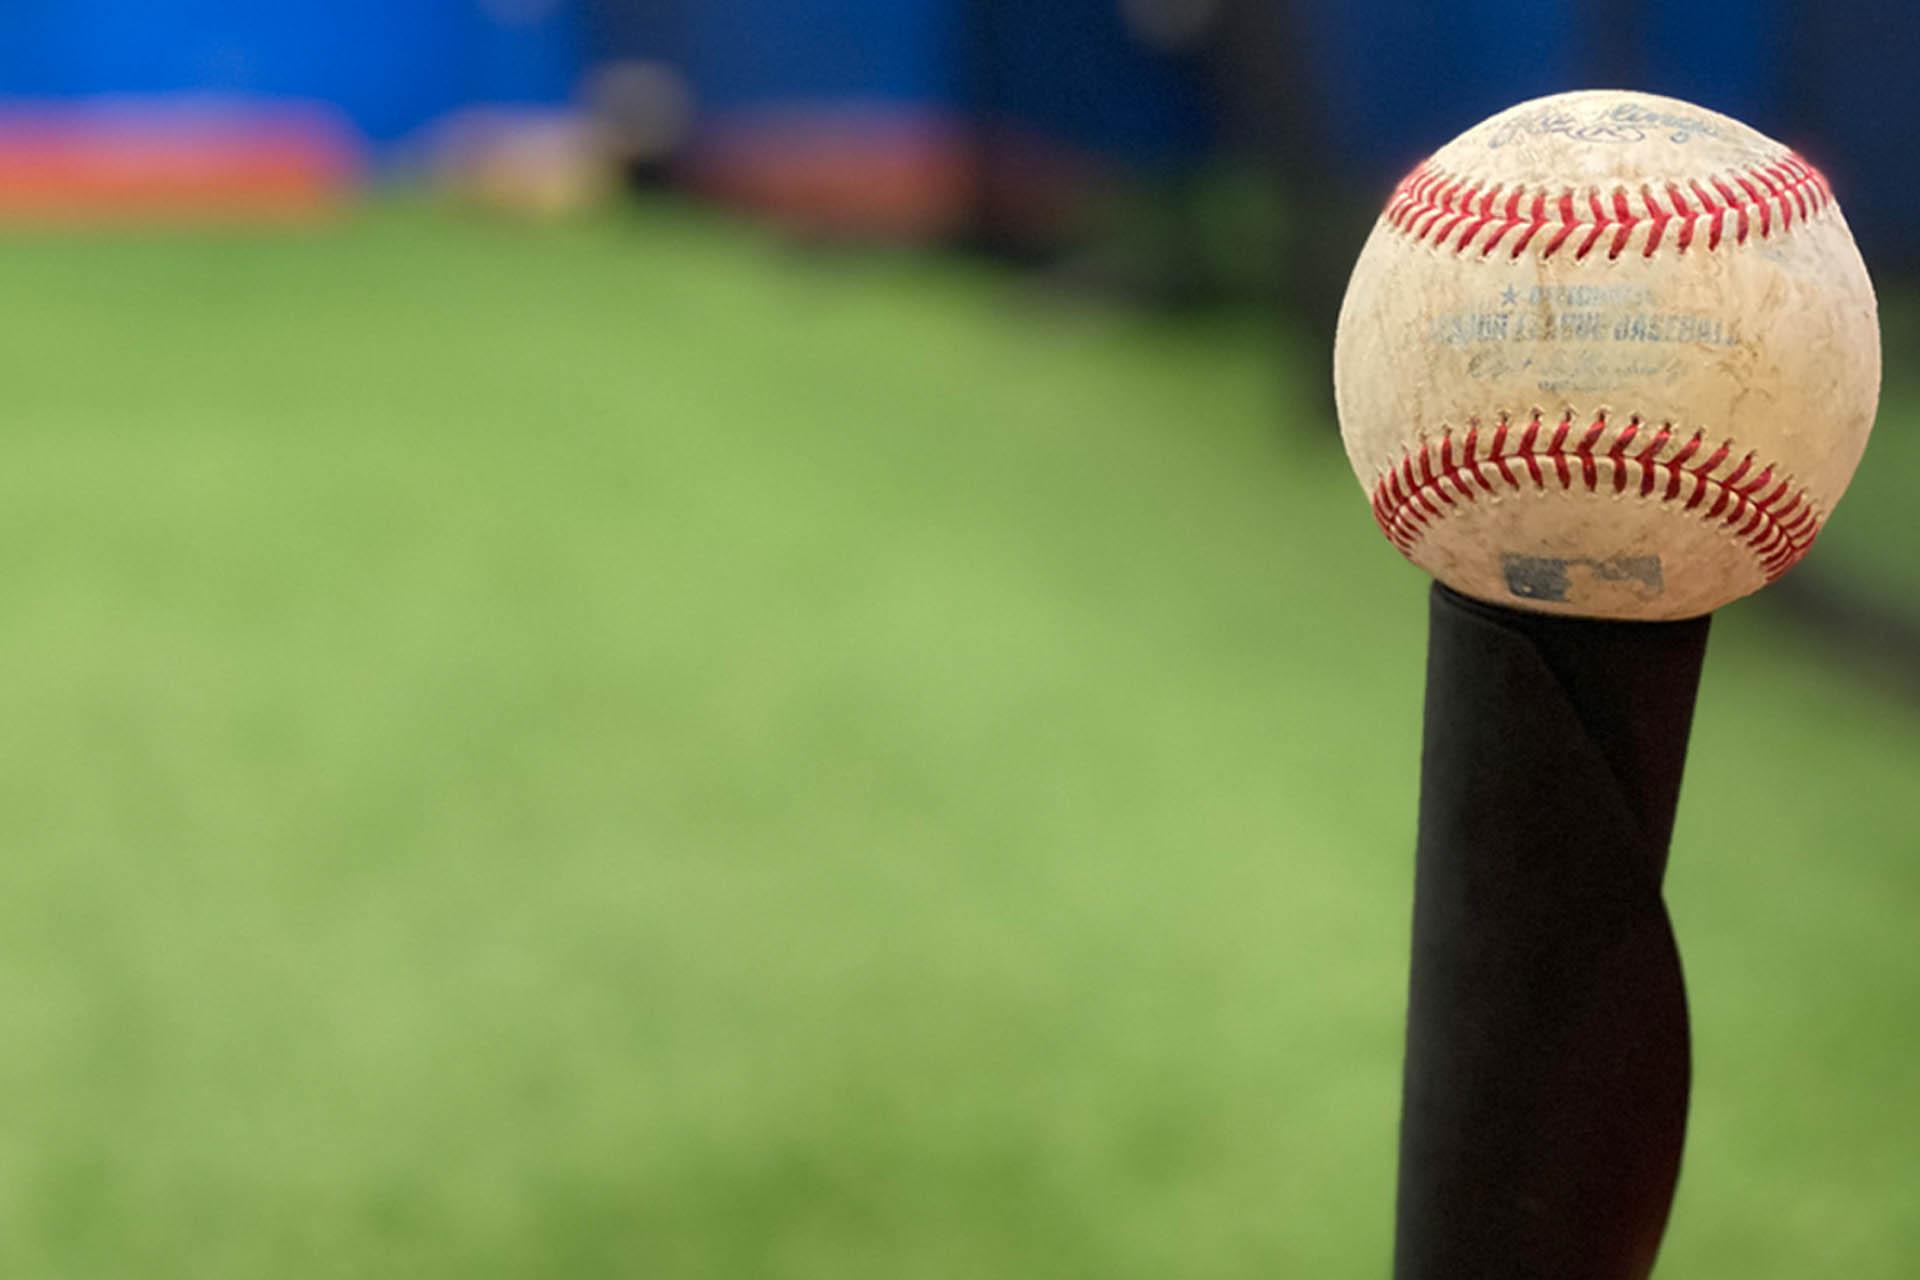 Baseball on Tee